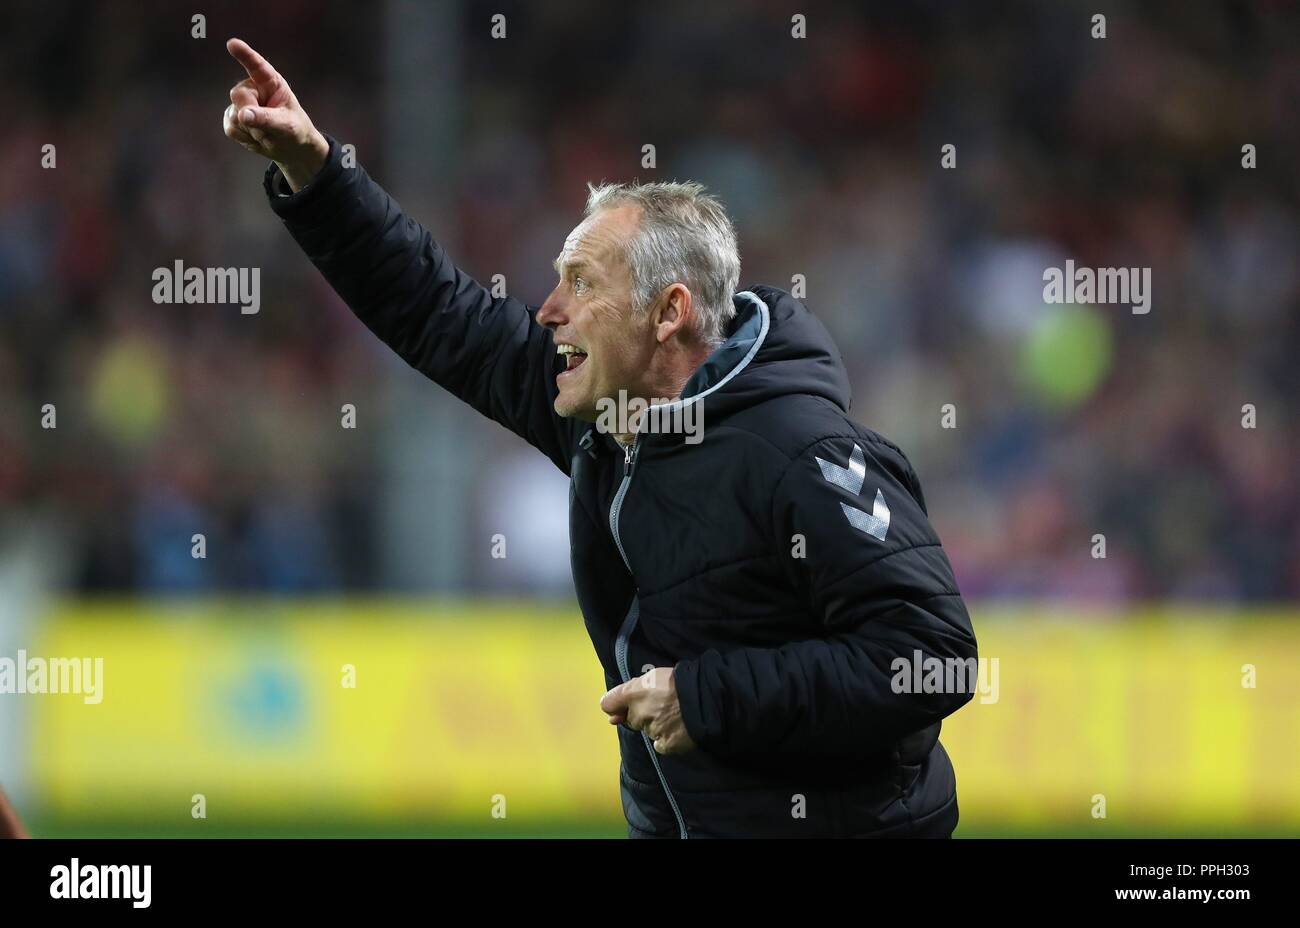 firo: 25.09.2018 Football, Football: 1. Bundesliga, Season 2018/2019 SC Freiburg - S04 FC Schalke 04 SCF coach, Christian Streich, gesture, gesture,   usage worldwide - Stock Image